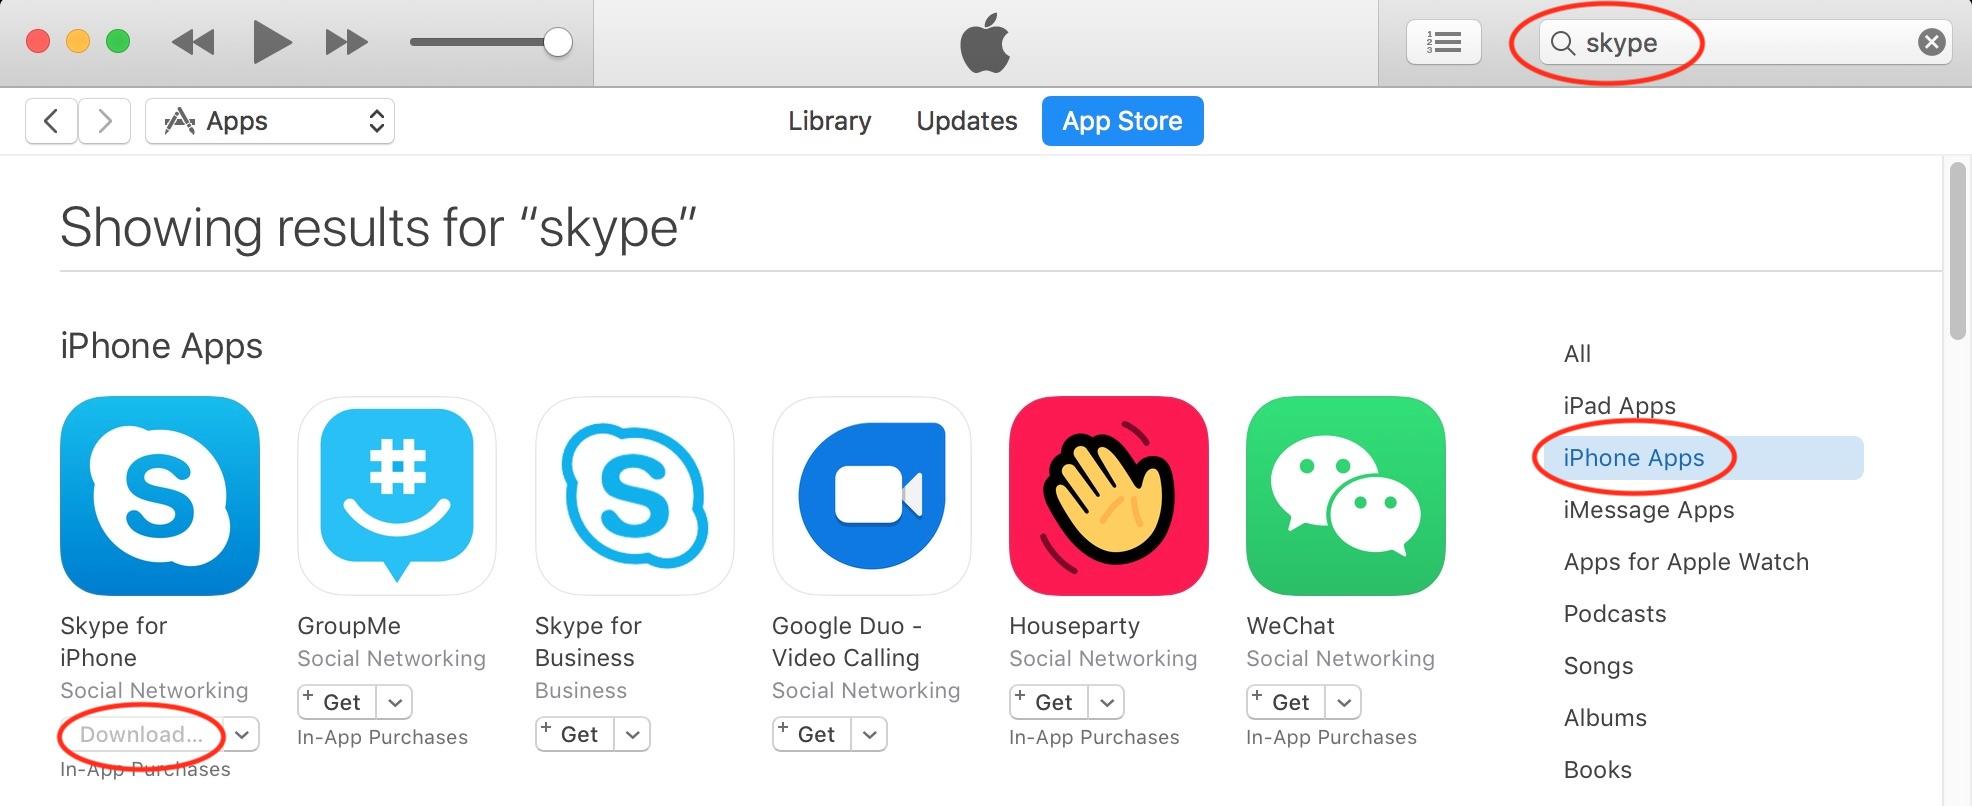 Ipad mini iOS 9 3 5 can't use Skype app anymore - Microsoft Community